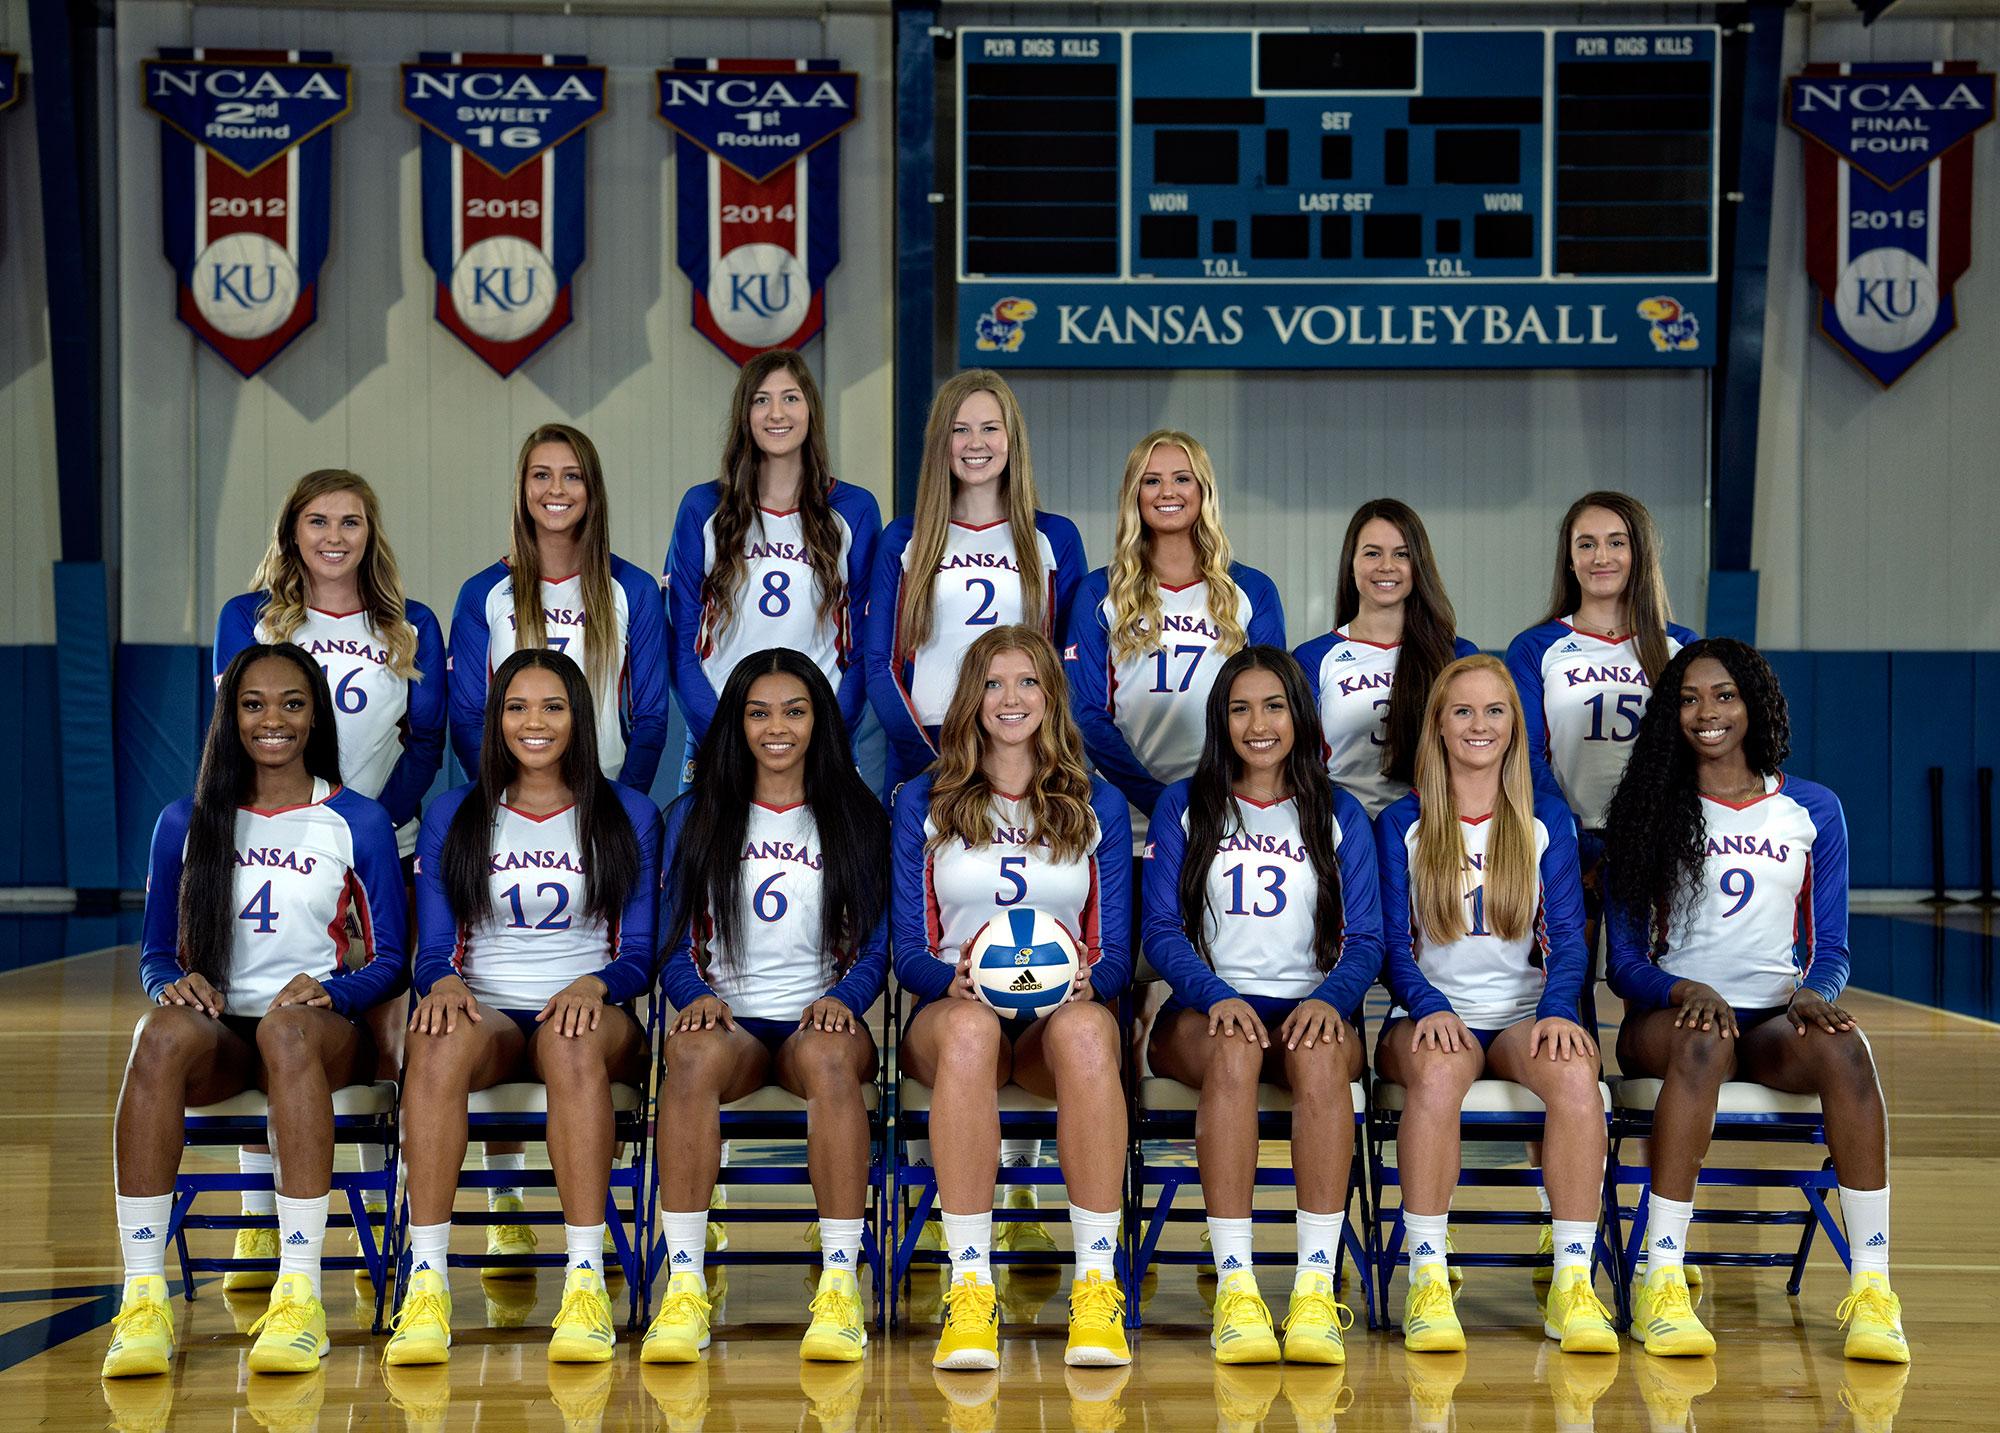 Volleyball 2018 Team Pictures Kansas Jayhawks